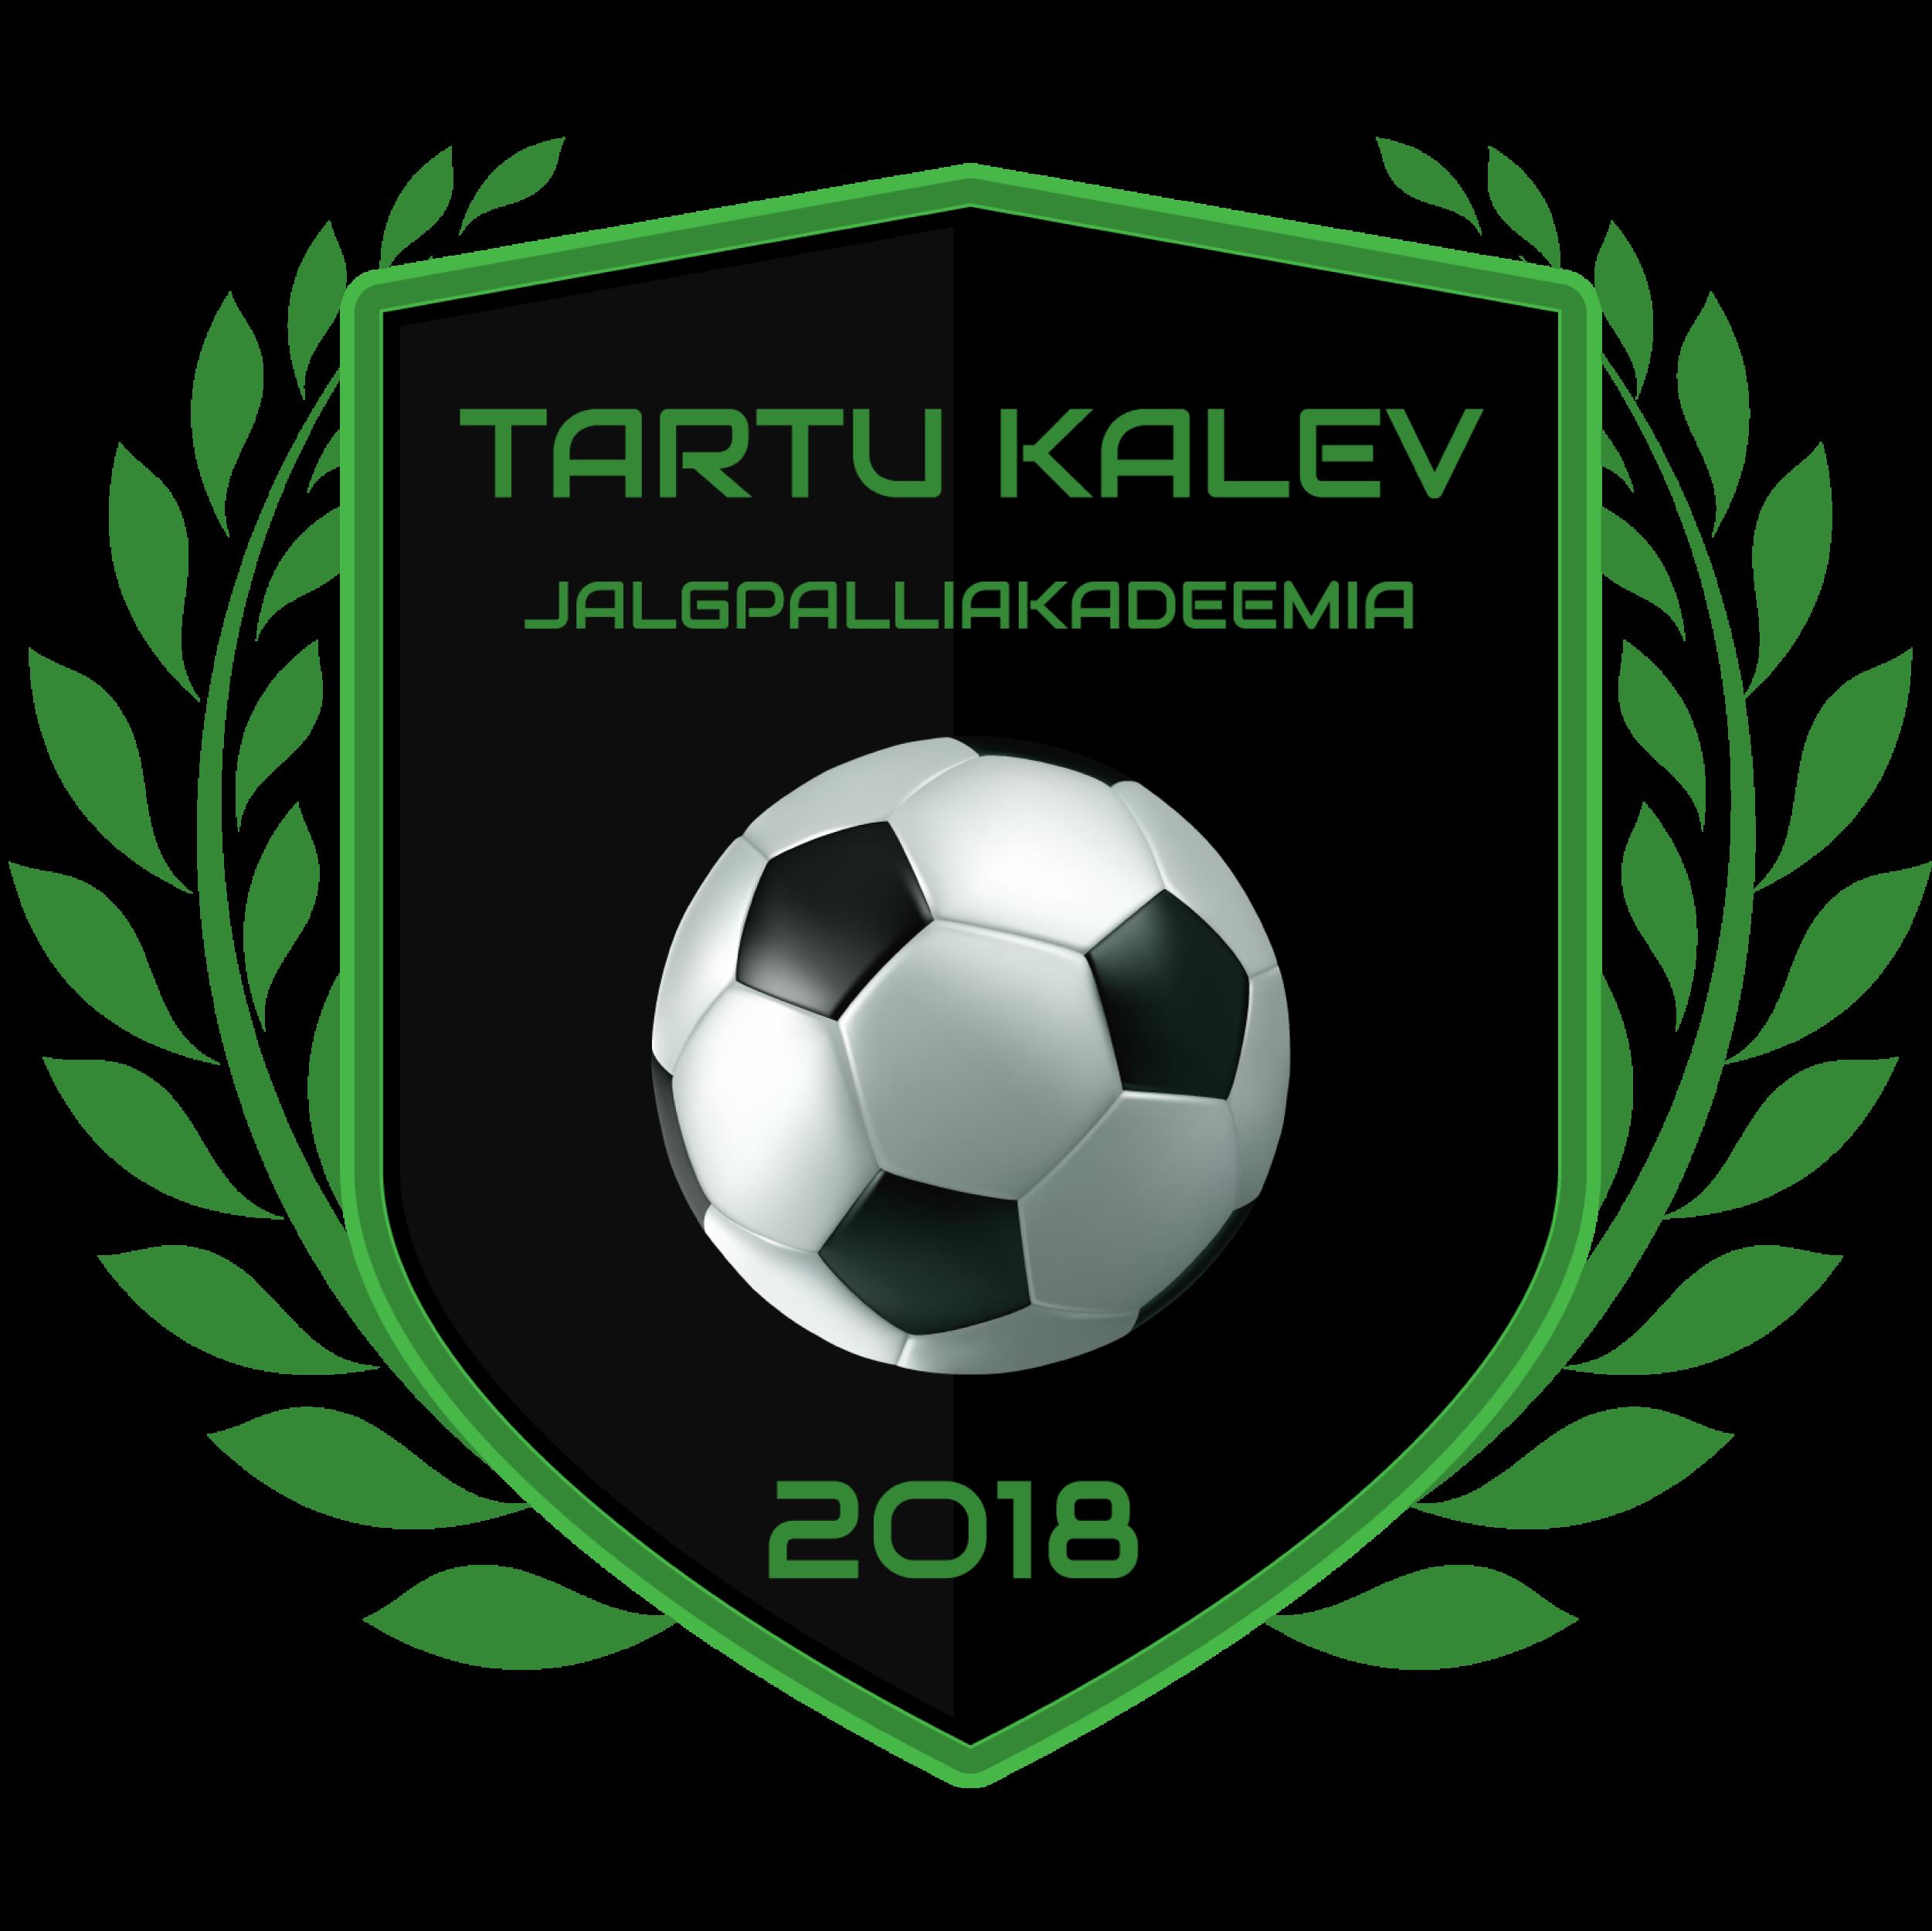 U-17 FA Tartu Kalev